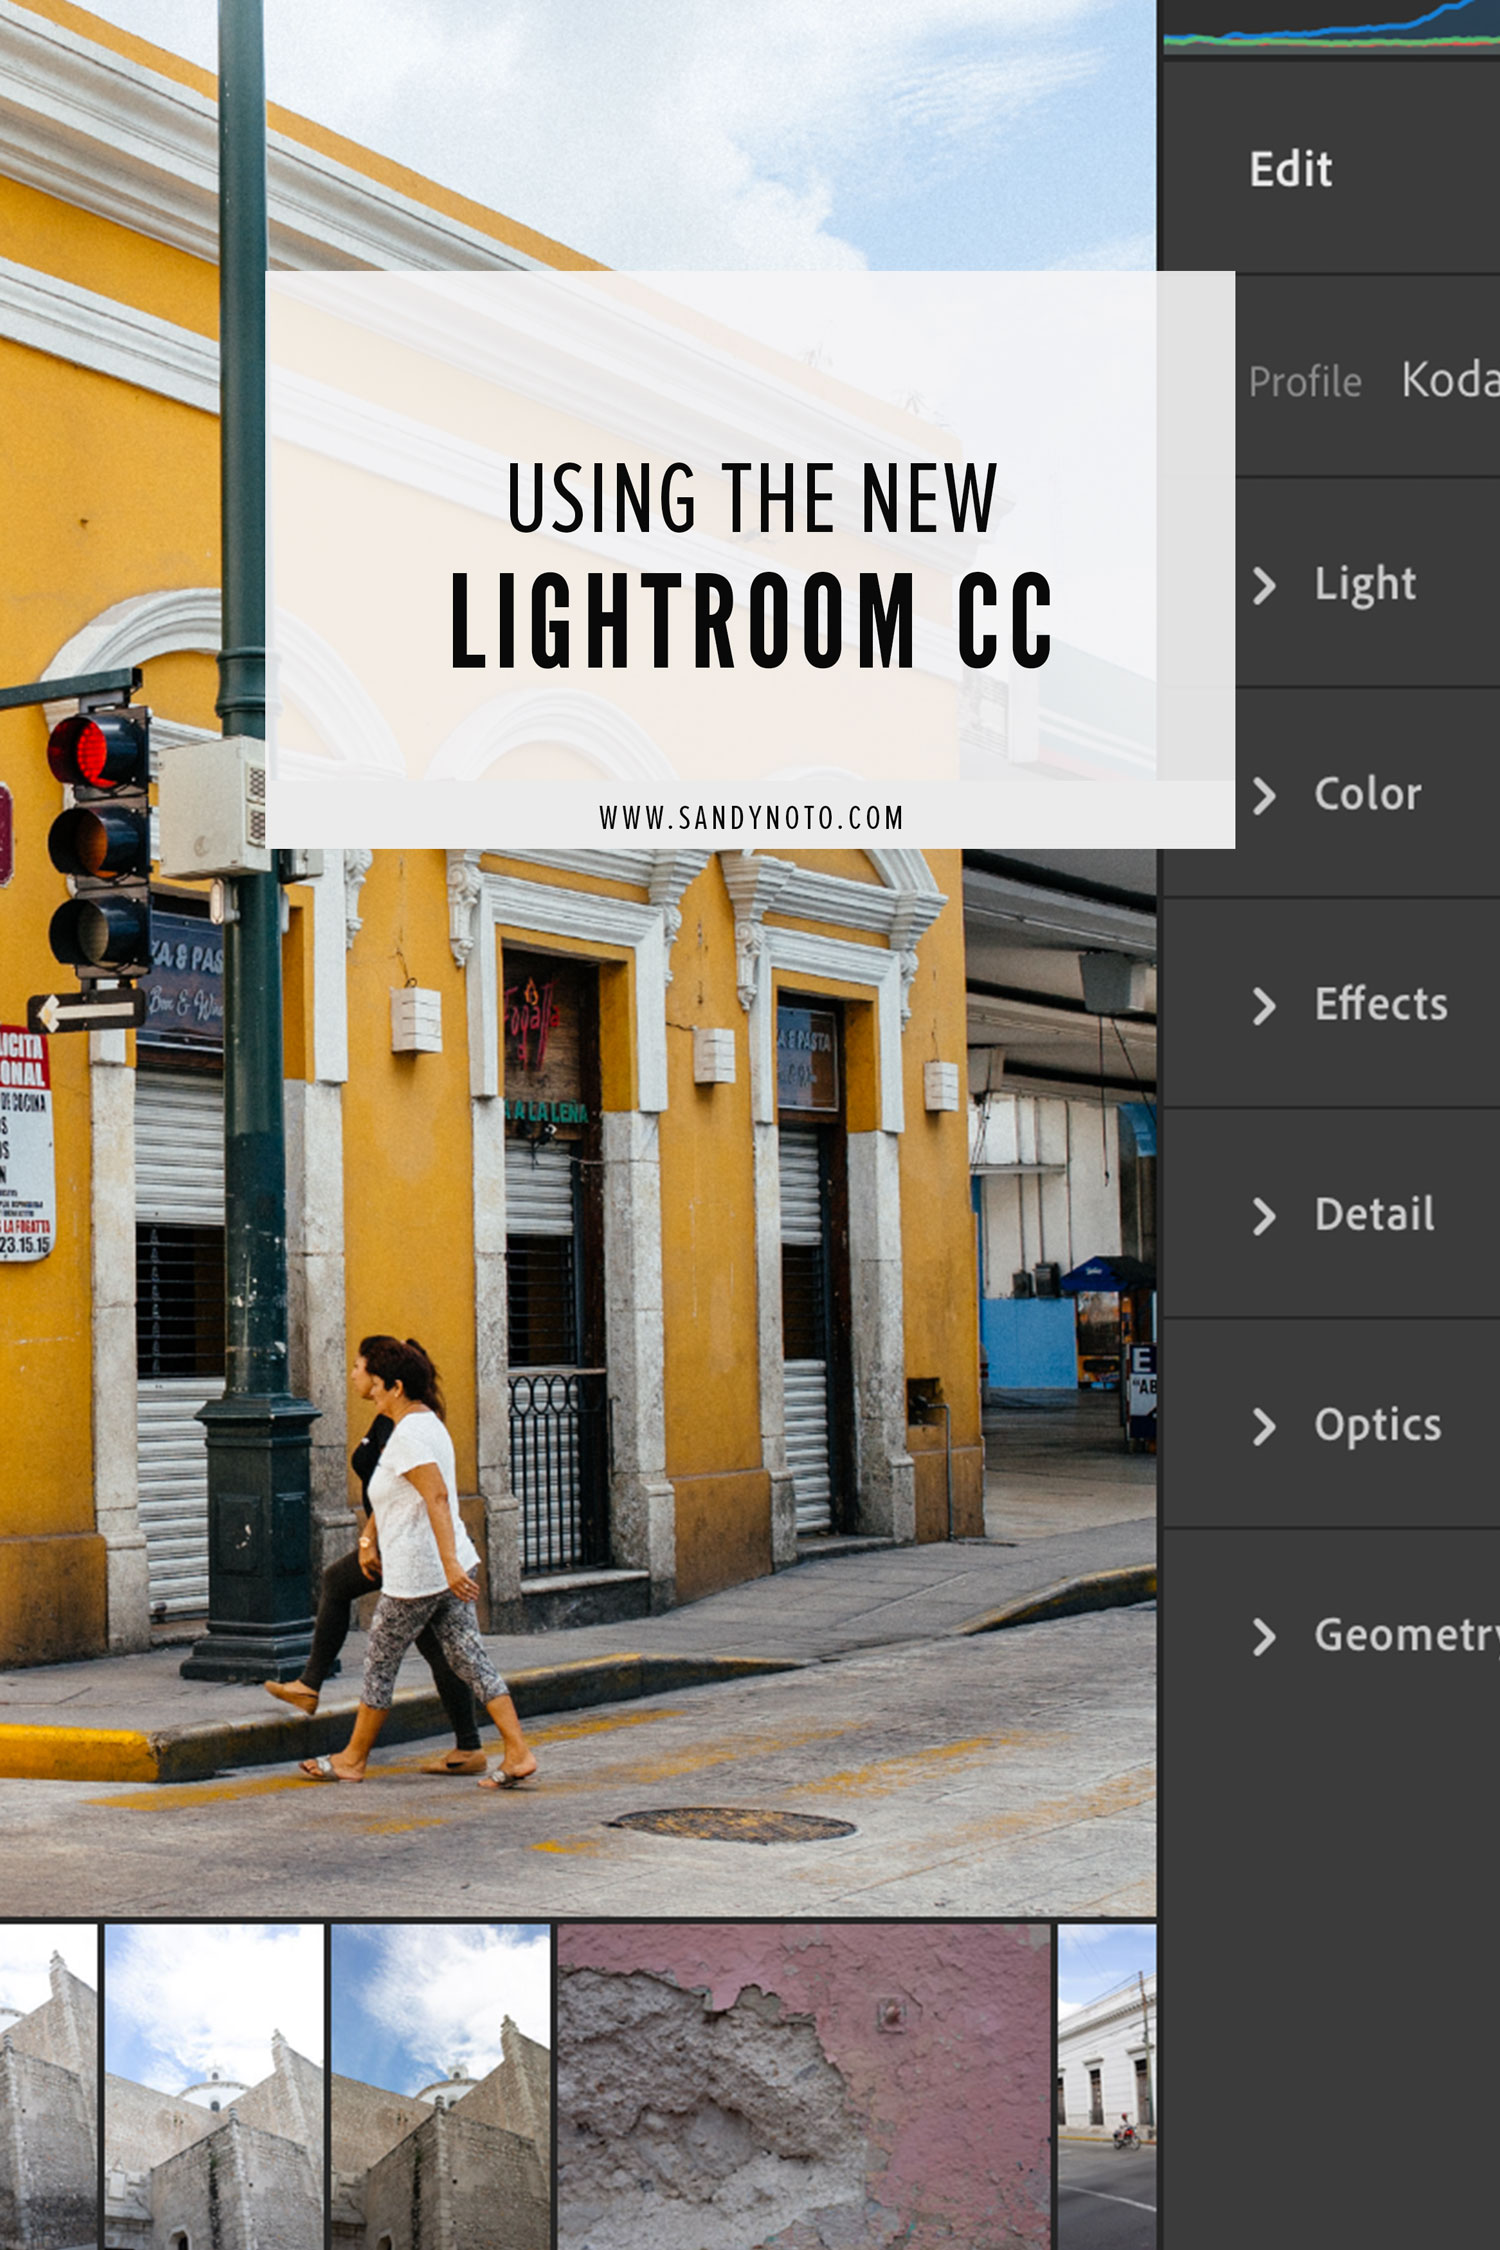 Using the New Lightroom CC